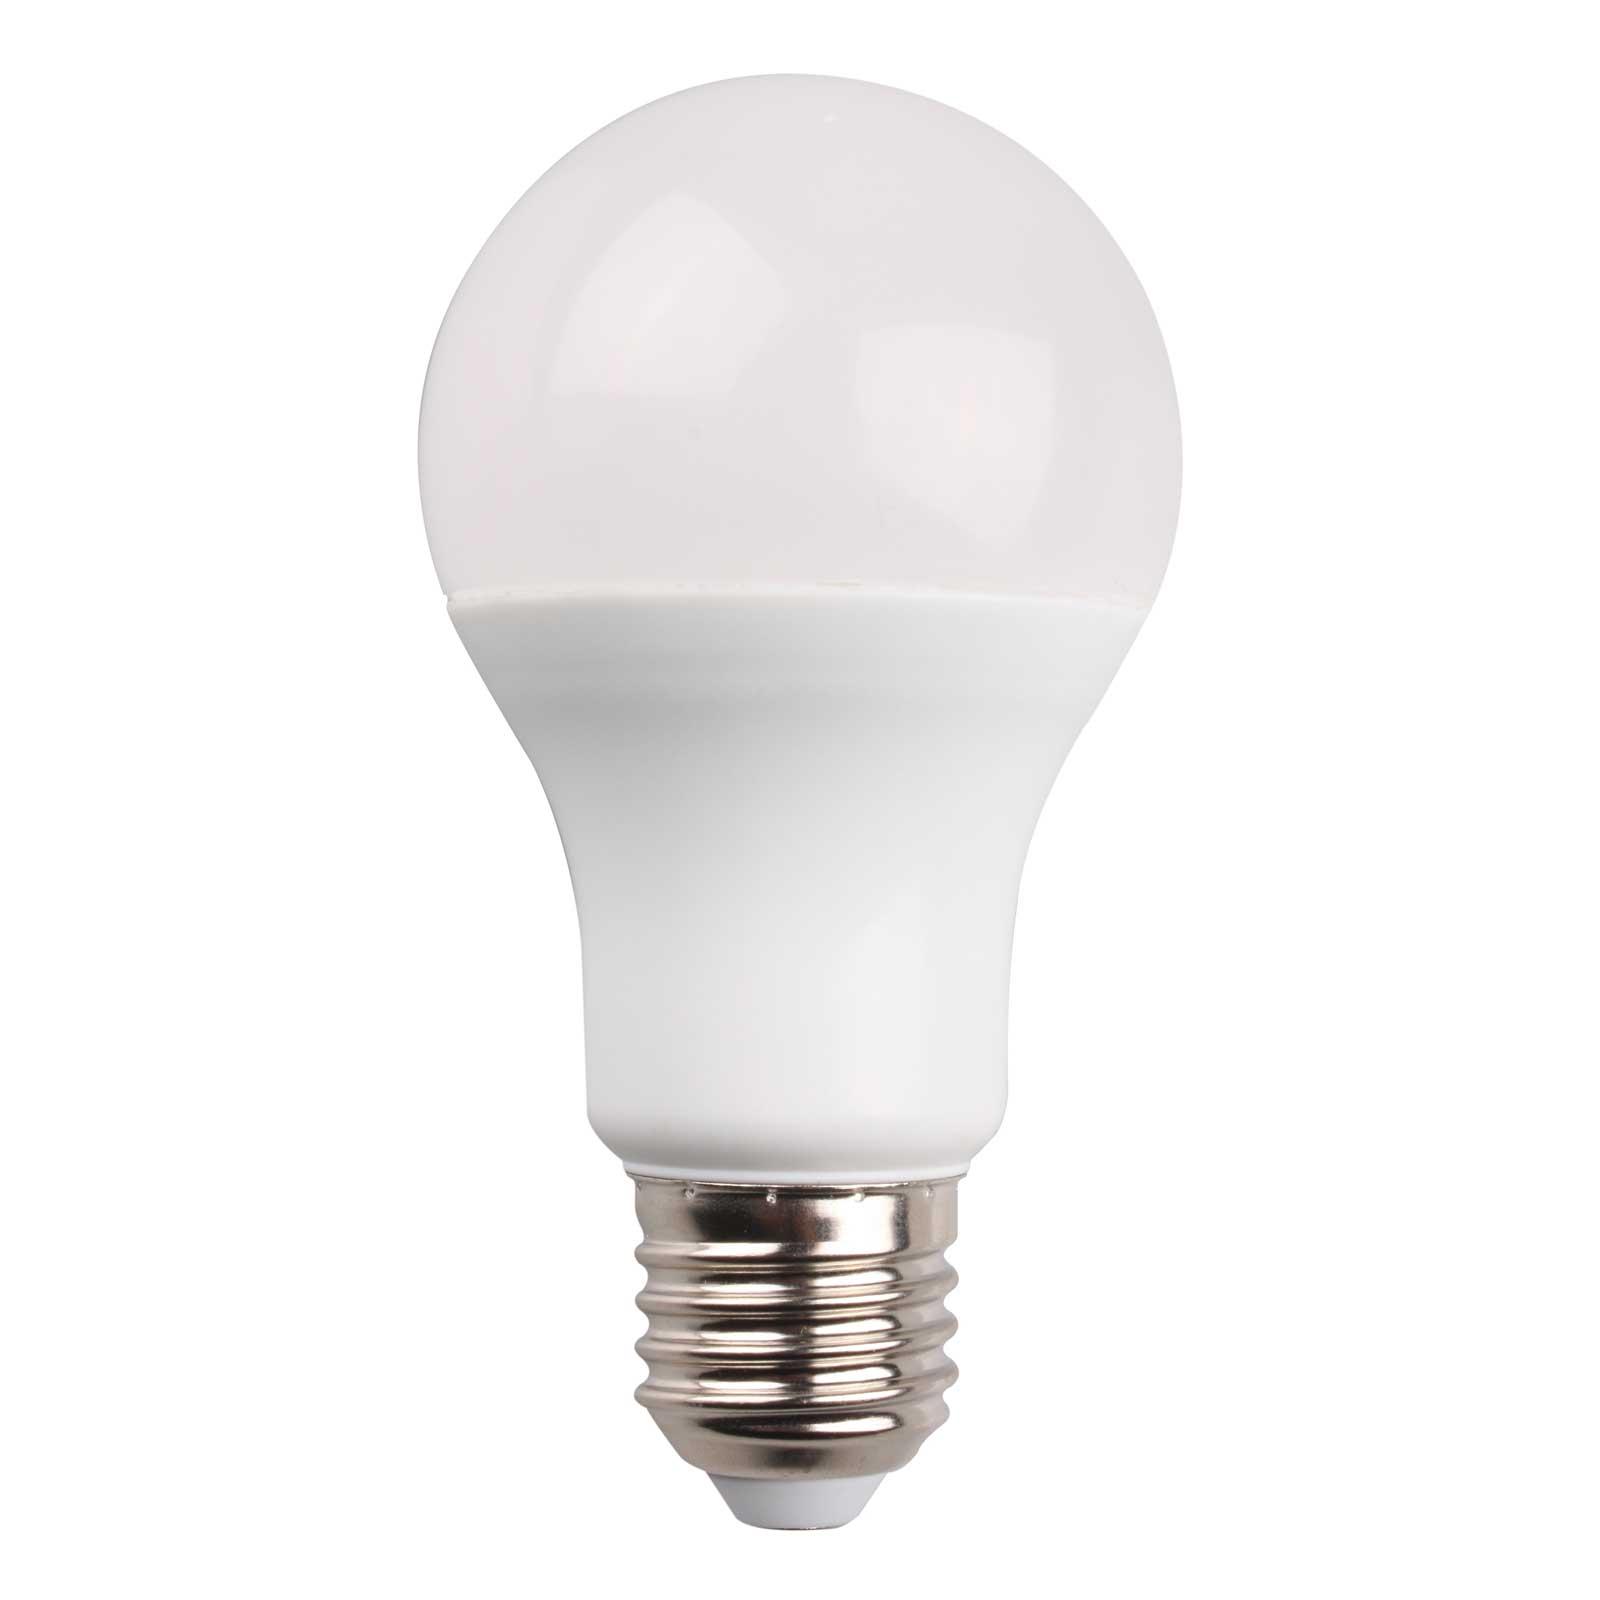 Lightme LED-Lampe E27 9W, RGBW, 810 Lumen, dimmbar